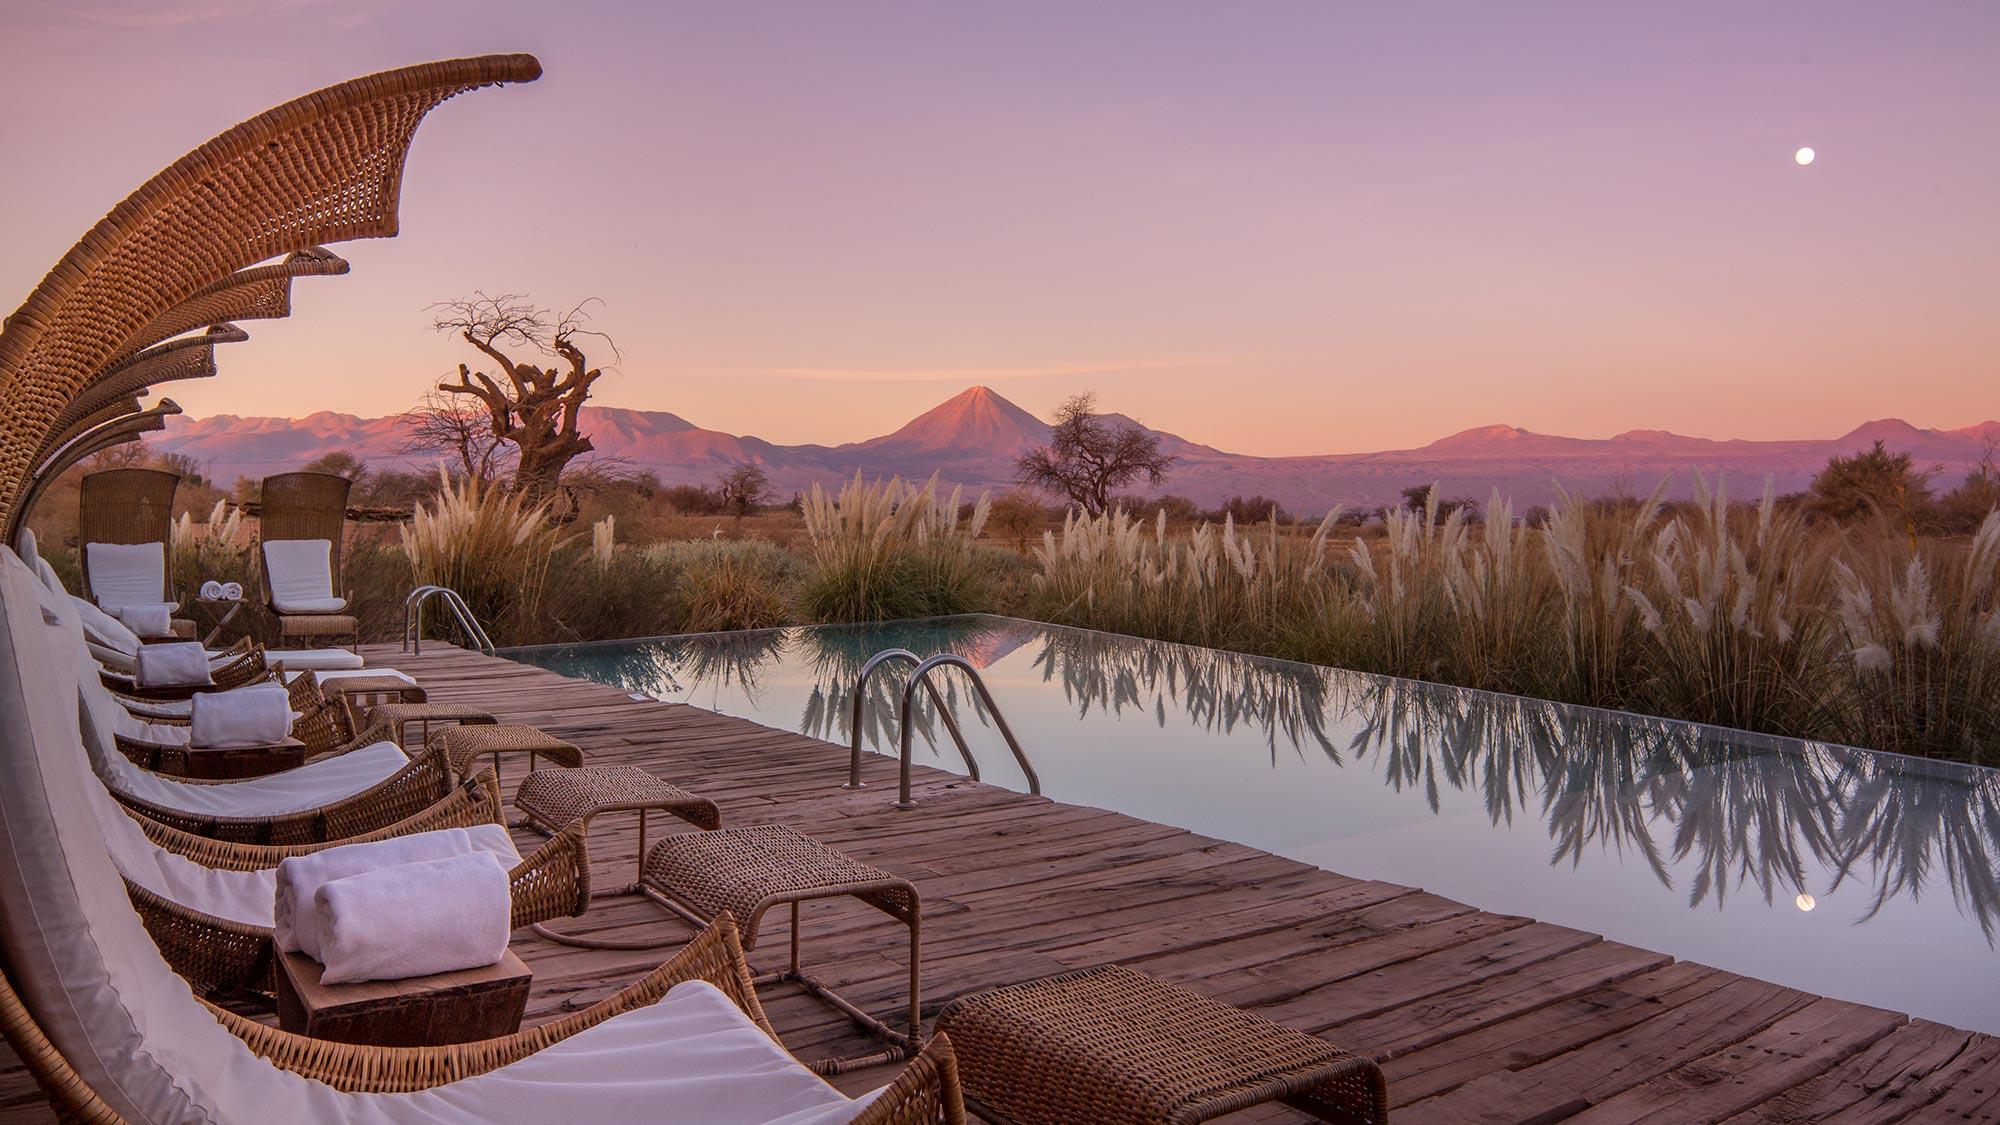 tierra-patagonia-hotel-and-spa-torres-del-paine-pool.jpg